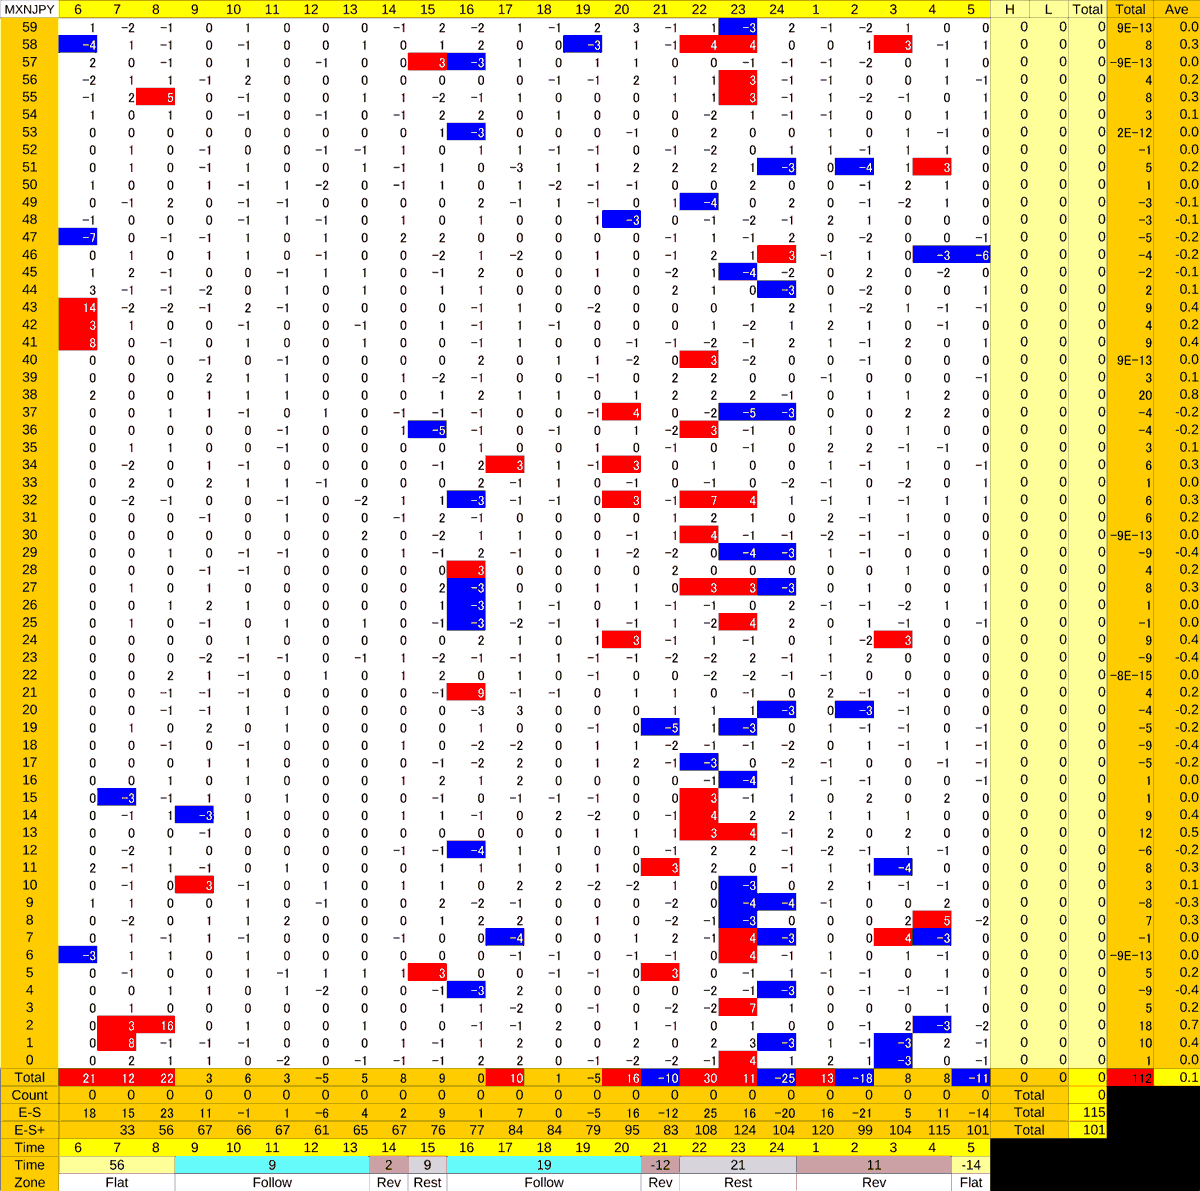 20201005_HS(3)MXNJPY